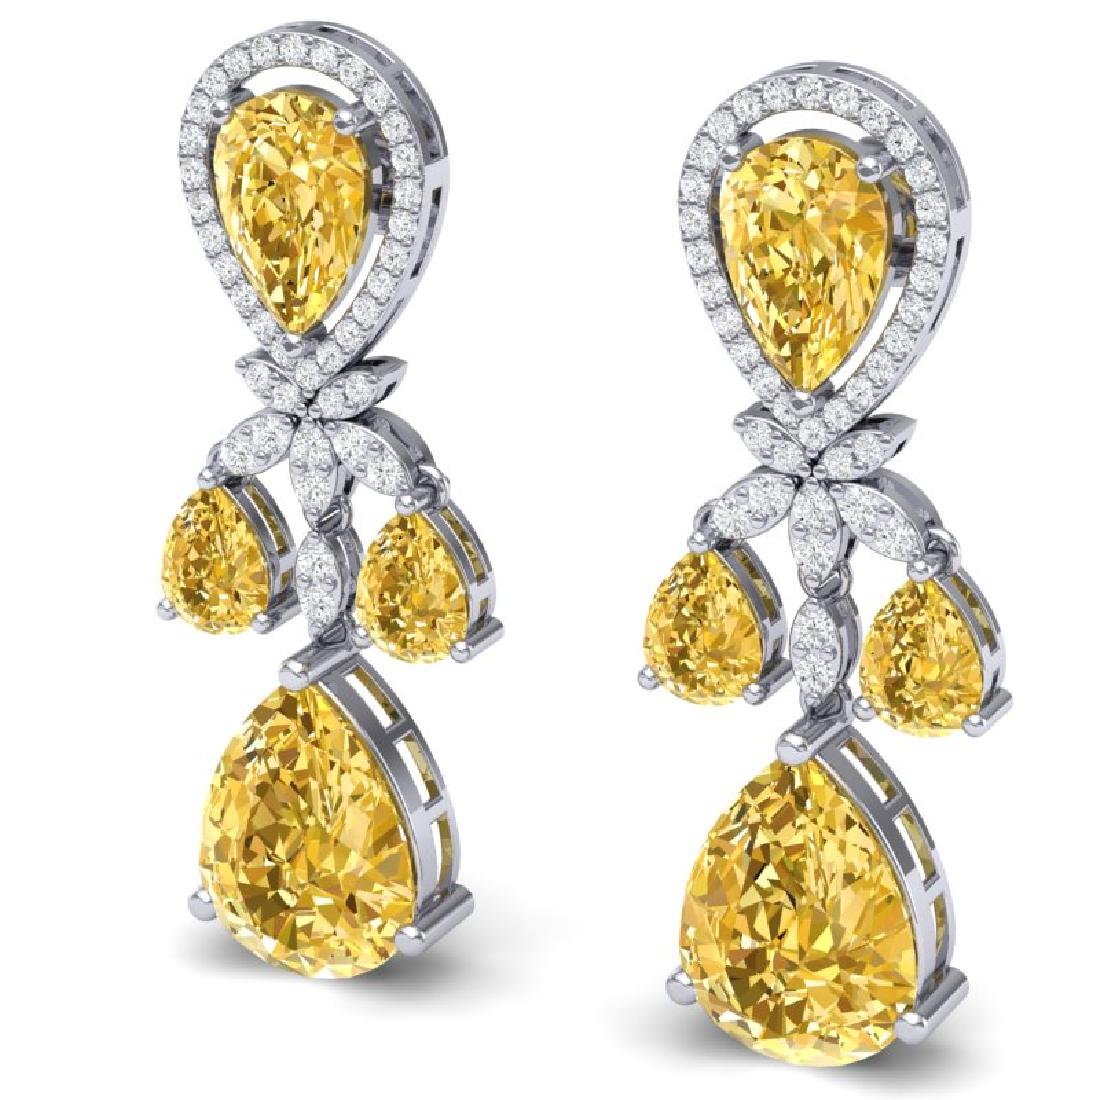 35.67 CTW Royalty Canary Citrine & VS Diamond Earrings - 2